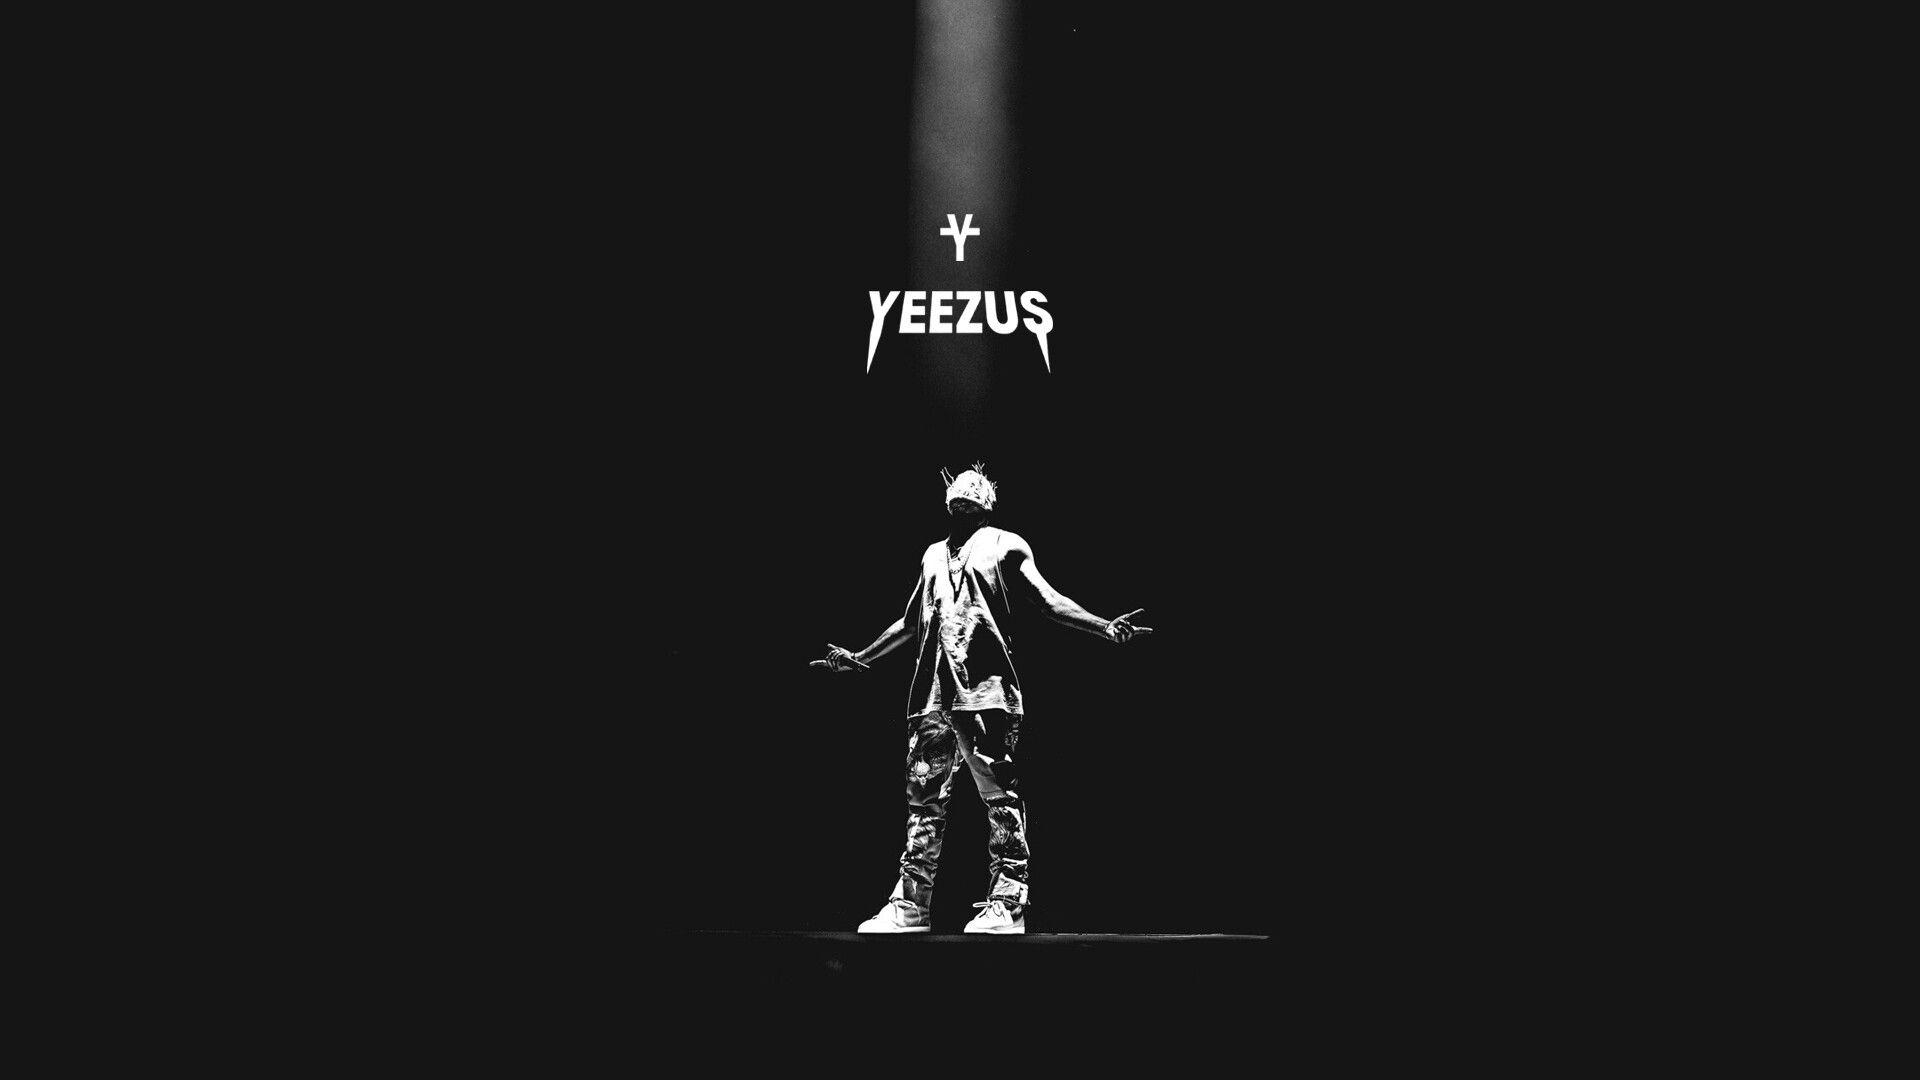 Pin By Tekkan On Yeezy Yeezus Wallpaper Kanye West Yeezus Yeezus